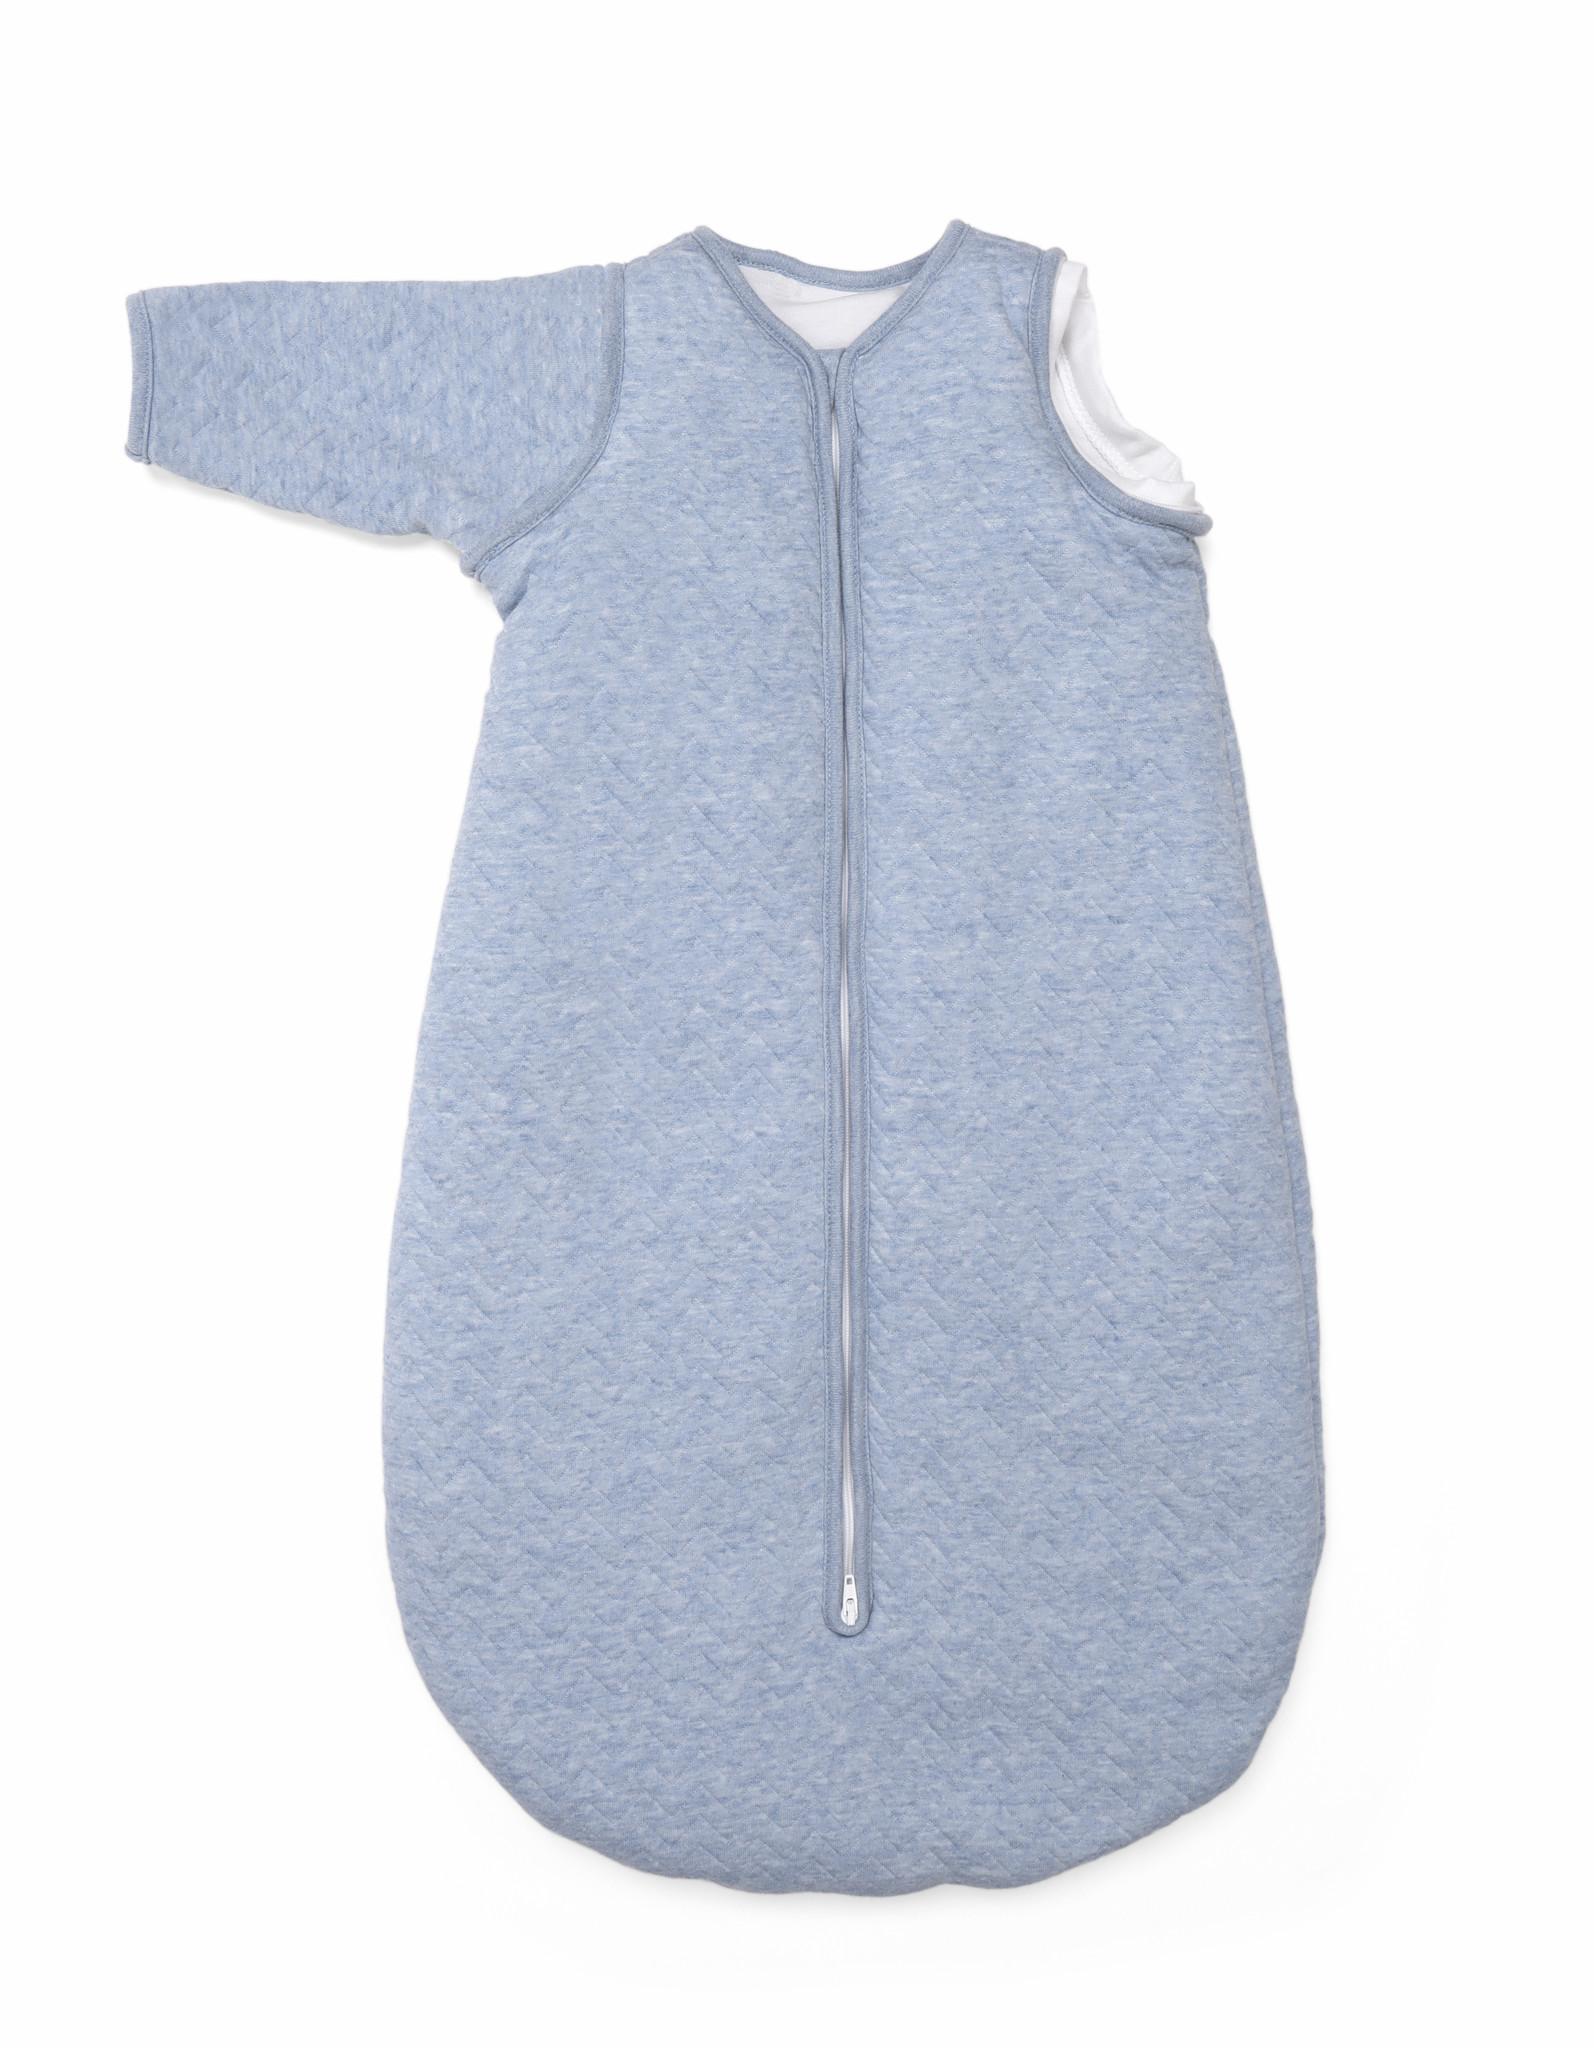 Jersey slaapzak 90cm met afritsbare mouwen Chevron Denim Blue-2